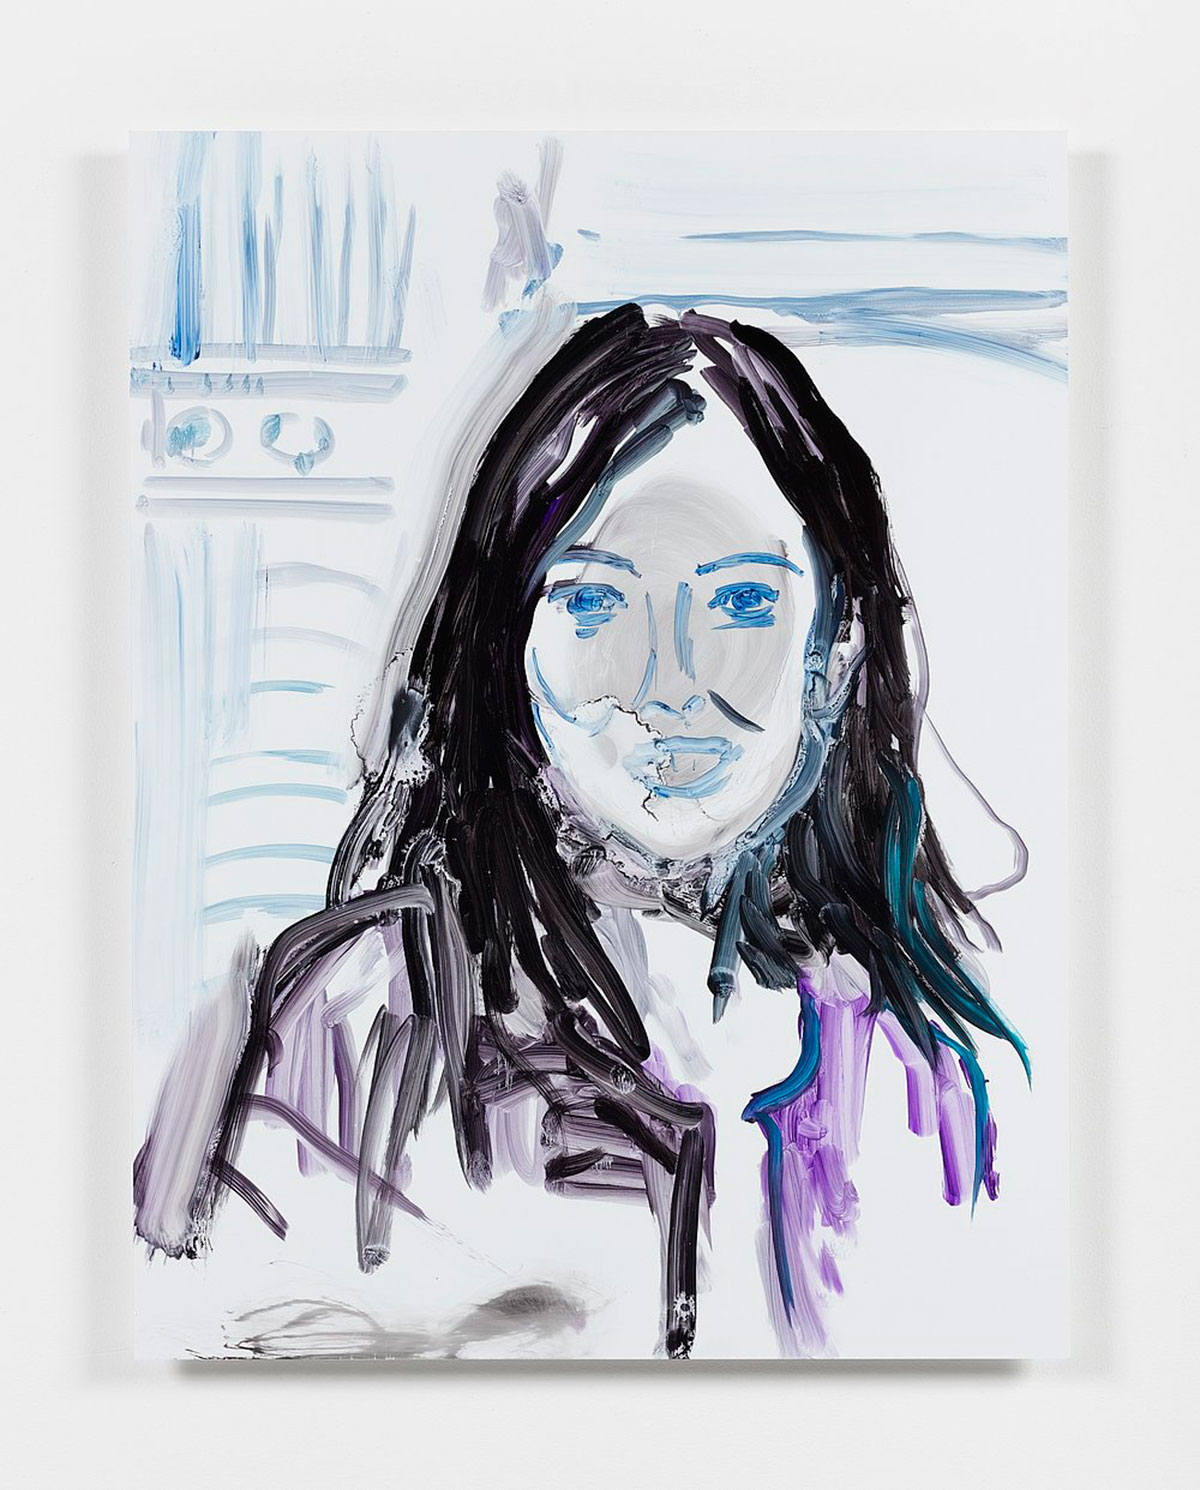 Reena Spaulings, Advisors, Detail 12 (Suzanne Modica), 2016, Acrylfarbe auf Dibond, 86,4 x 66 cm, © Courtesy of the artist, Private Sammlung und Campoli Presti, London/Paris